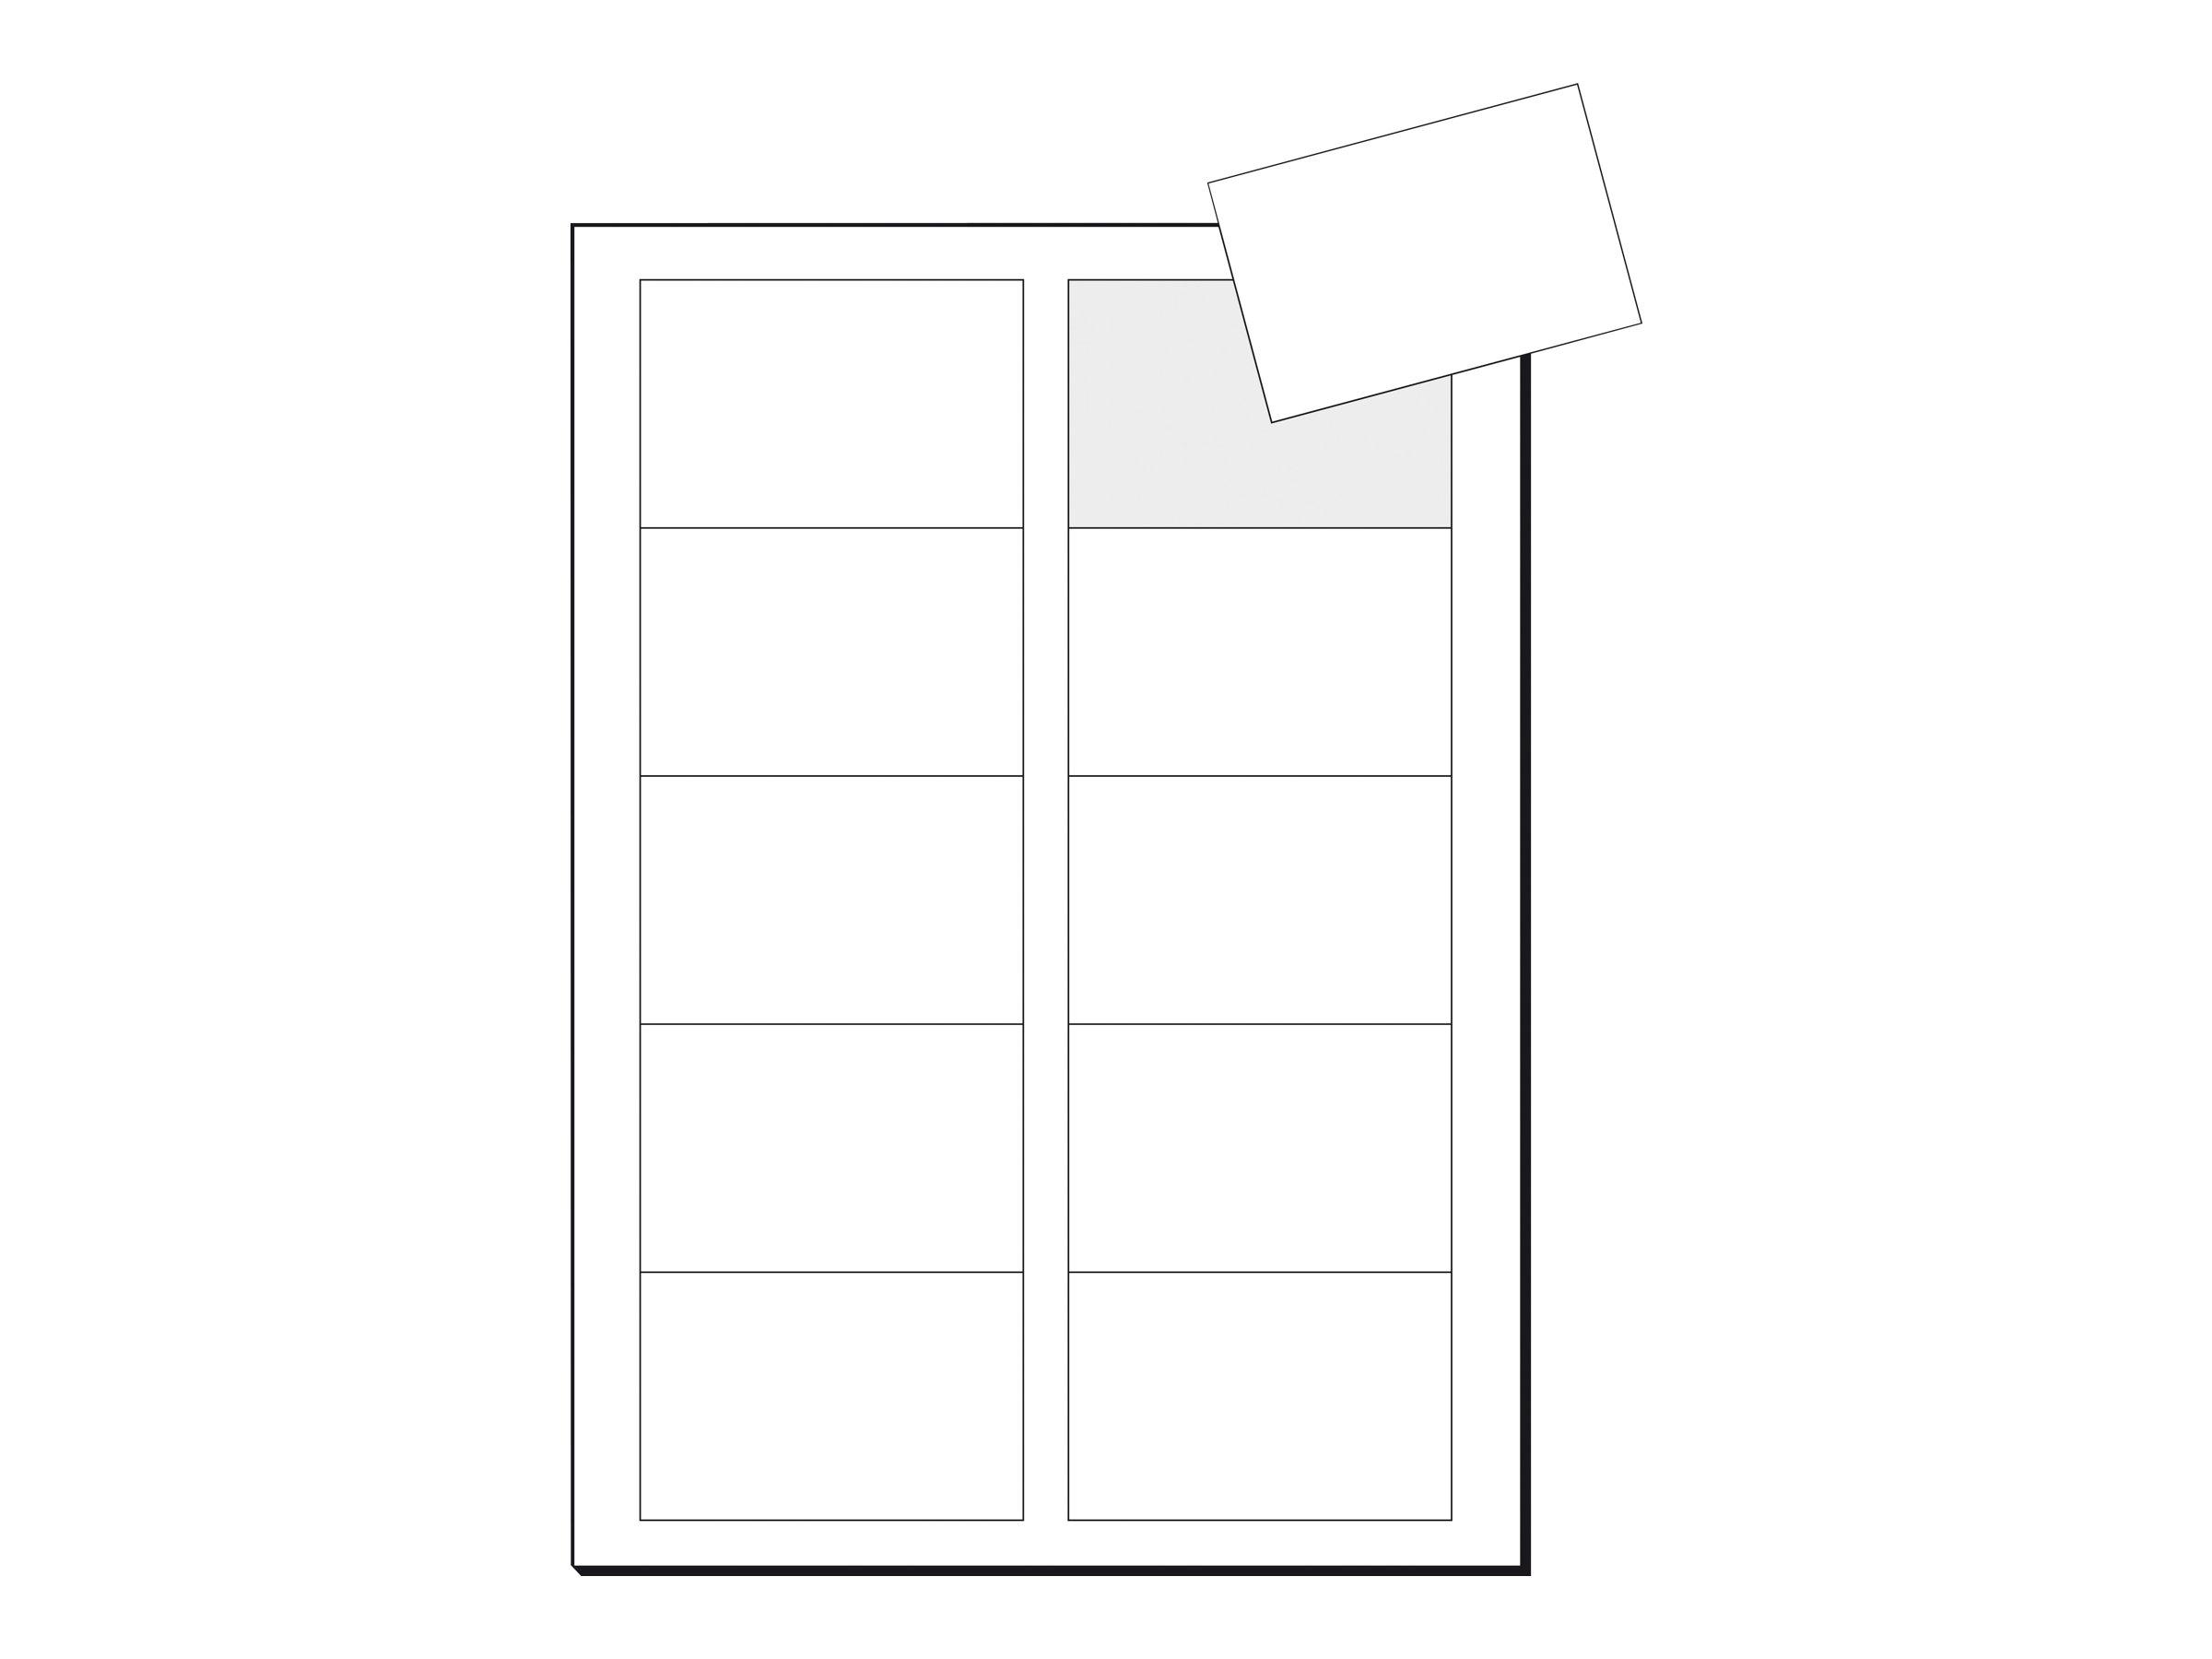 Sigel IP520 - Hochweiß - 85 x 55 mm - 210 g/m² - 100 Karte(n) (10 Bogen x 10)